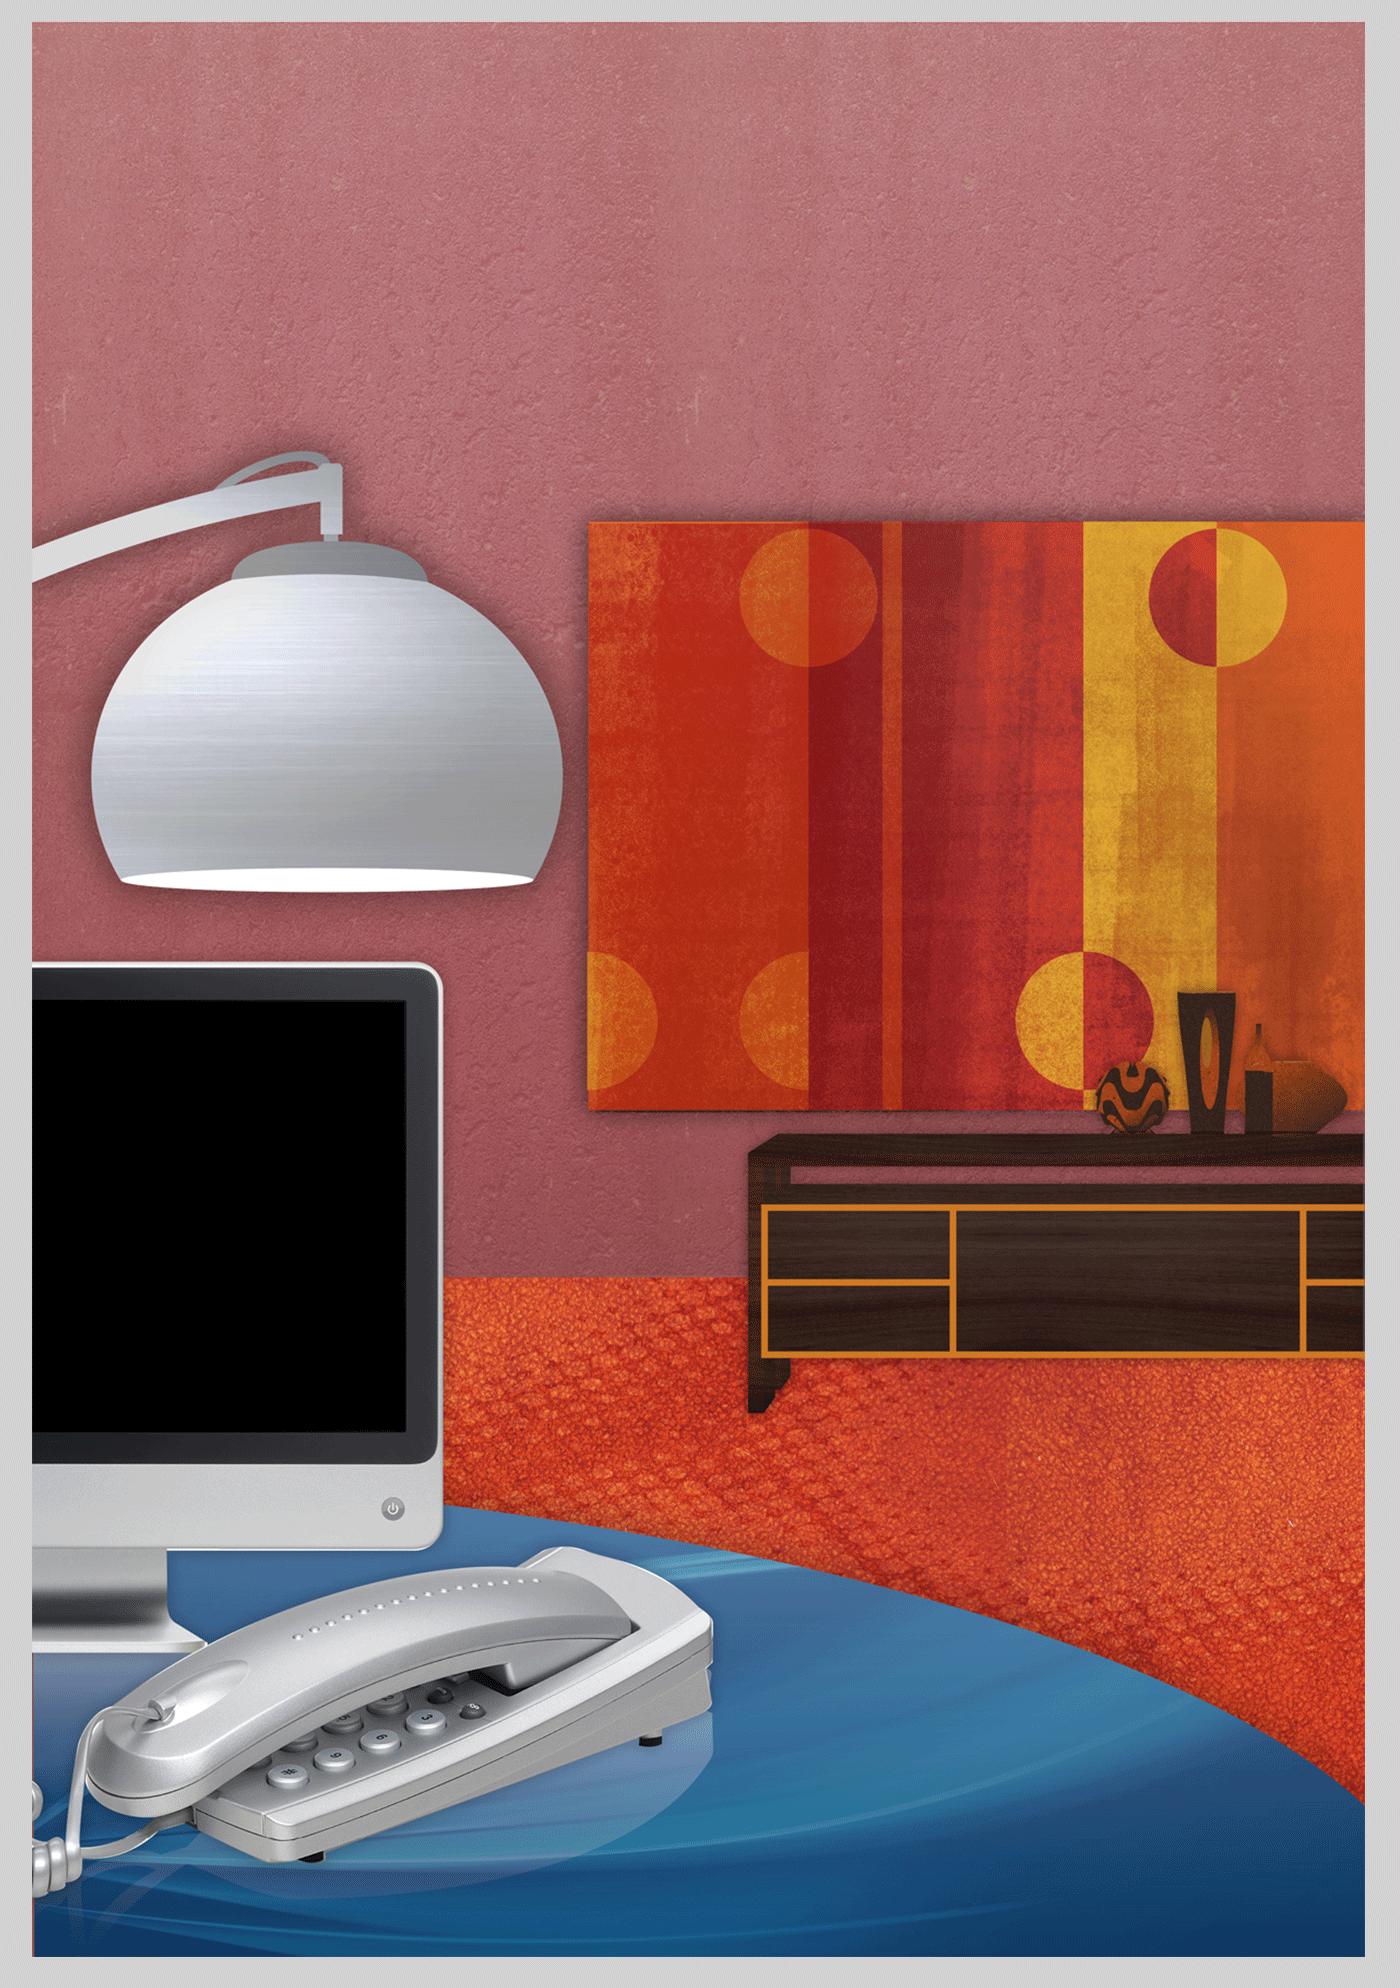 architecture architettura design Illustrator Interior Texture illustration Vectorial vettoriale